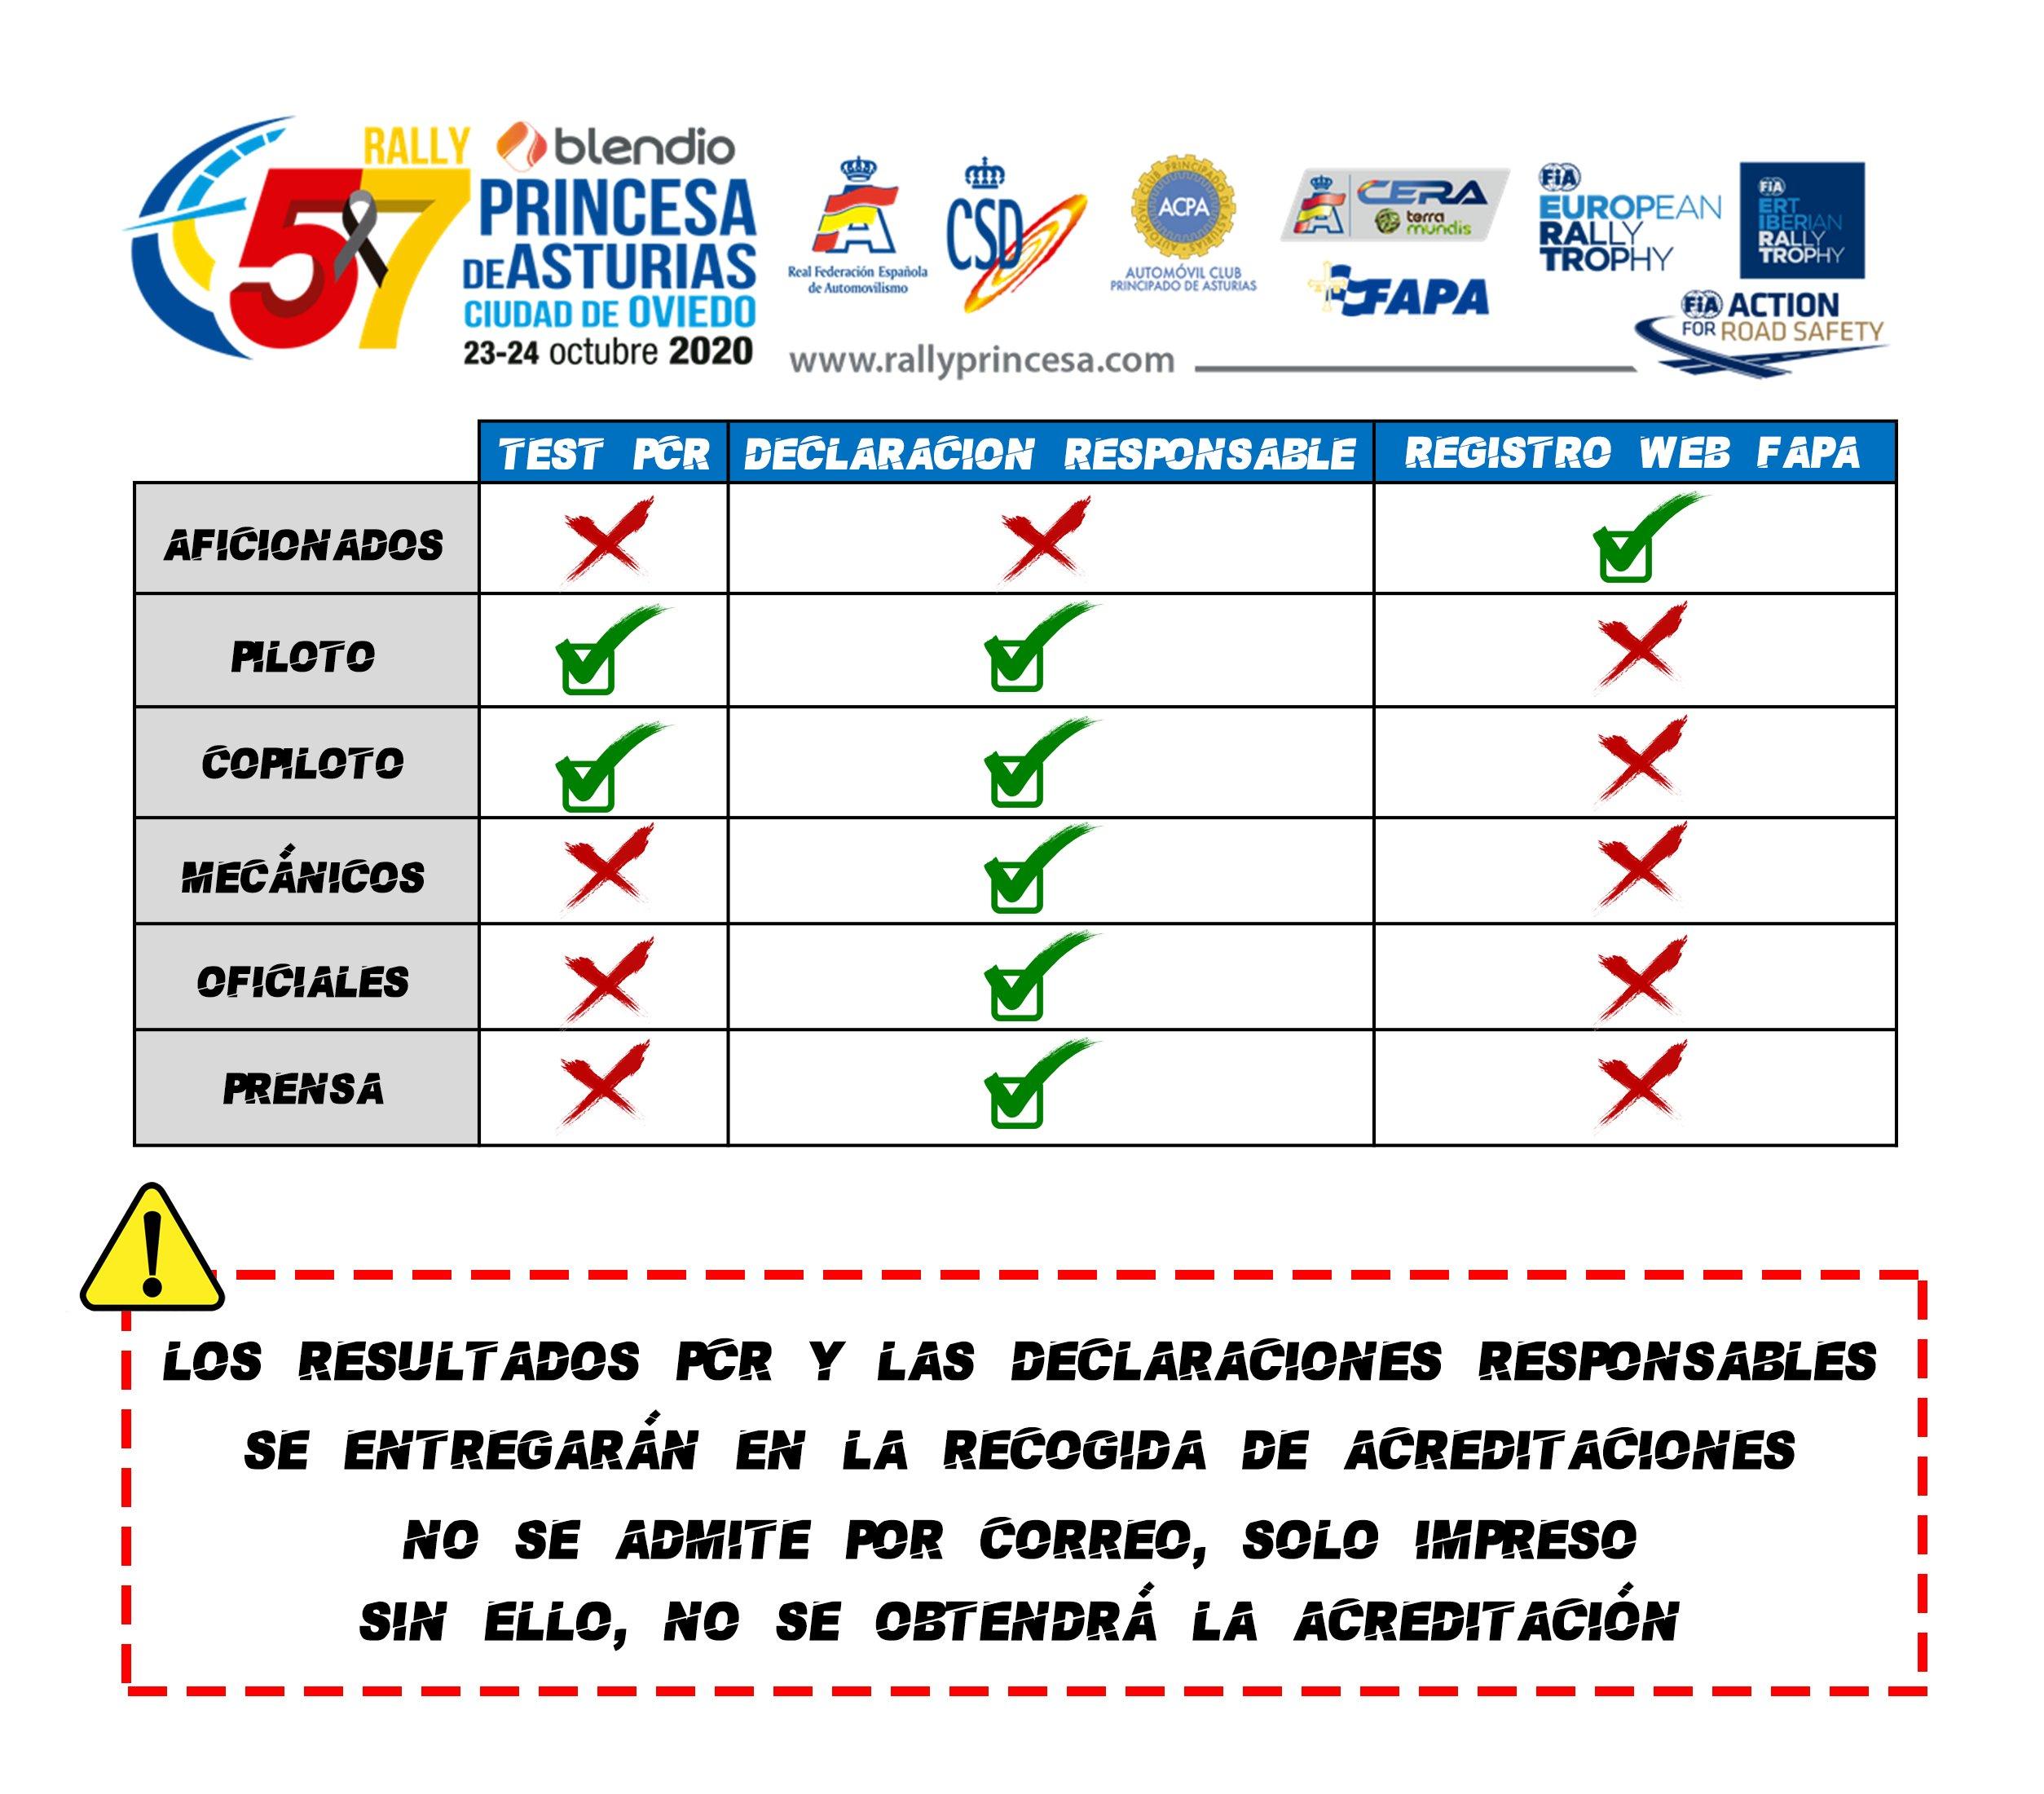 CERA + ERT: 57º Rallye Princesa de Asturias - Ciudad de Oviedo [23-24 Octubre] EksyFzWXUAAj206?format=jpg&name=4096x4096